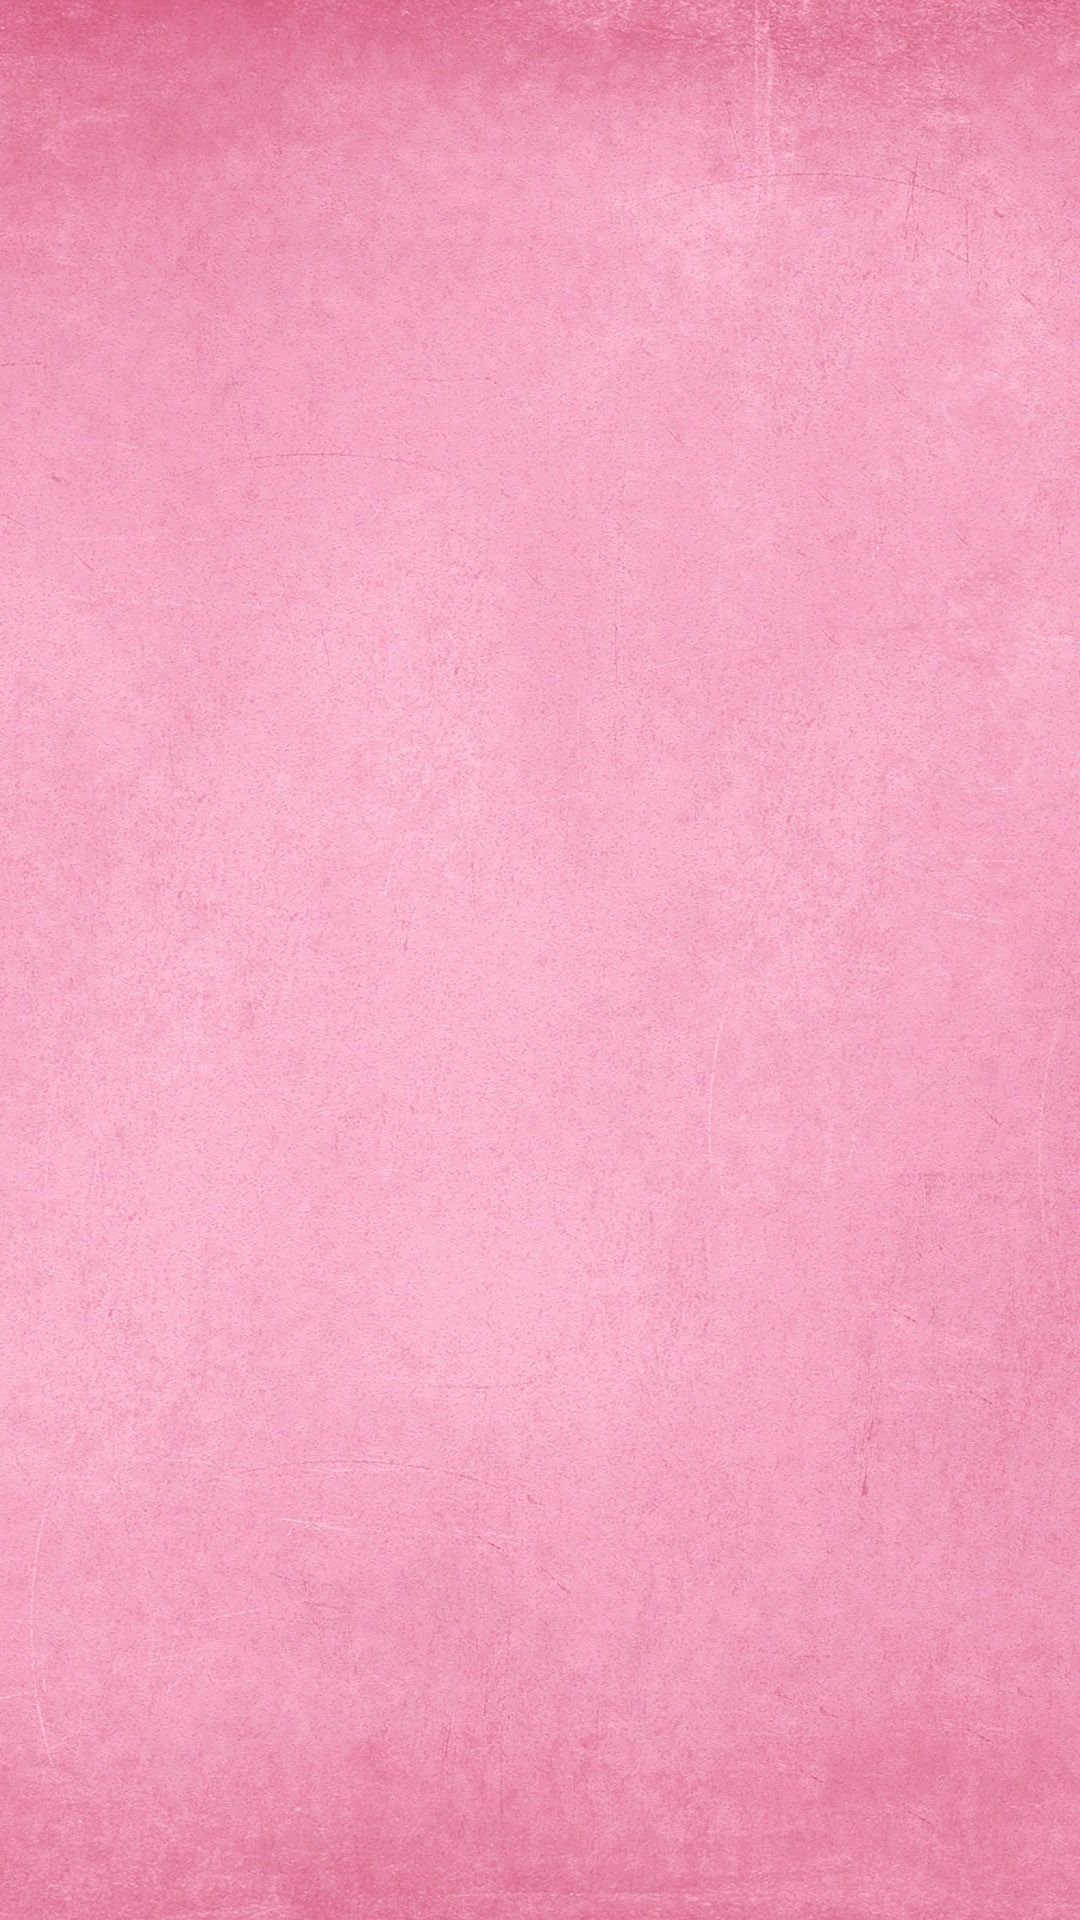 Pink texture Mobile Wallpaper Pink wallpaper mobile